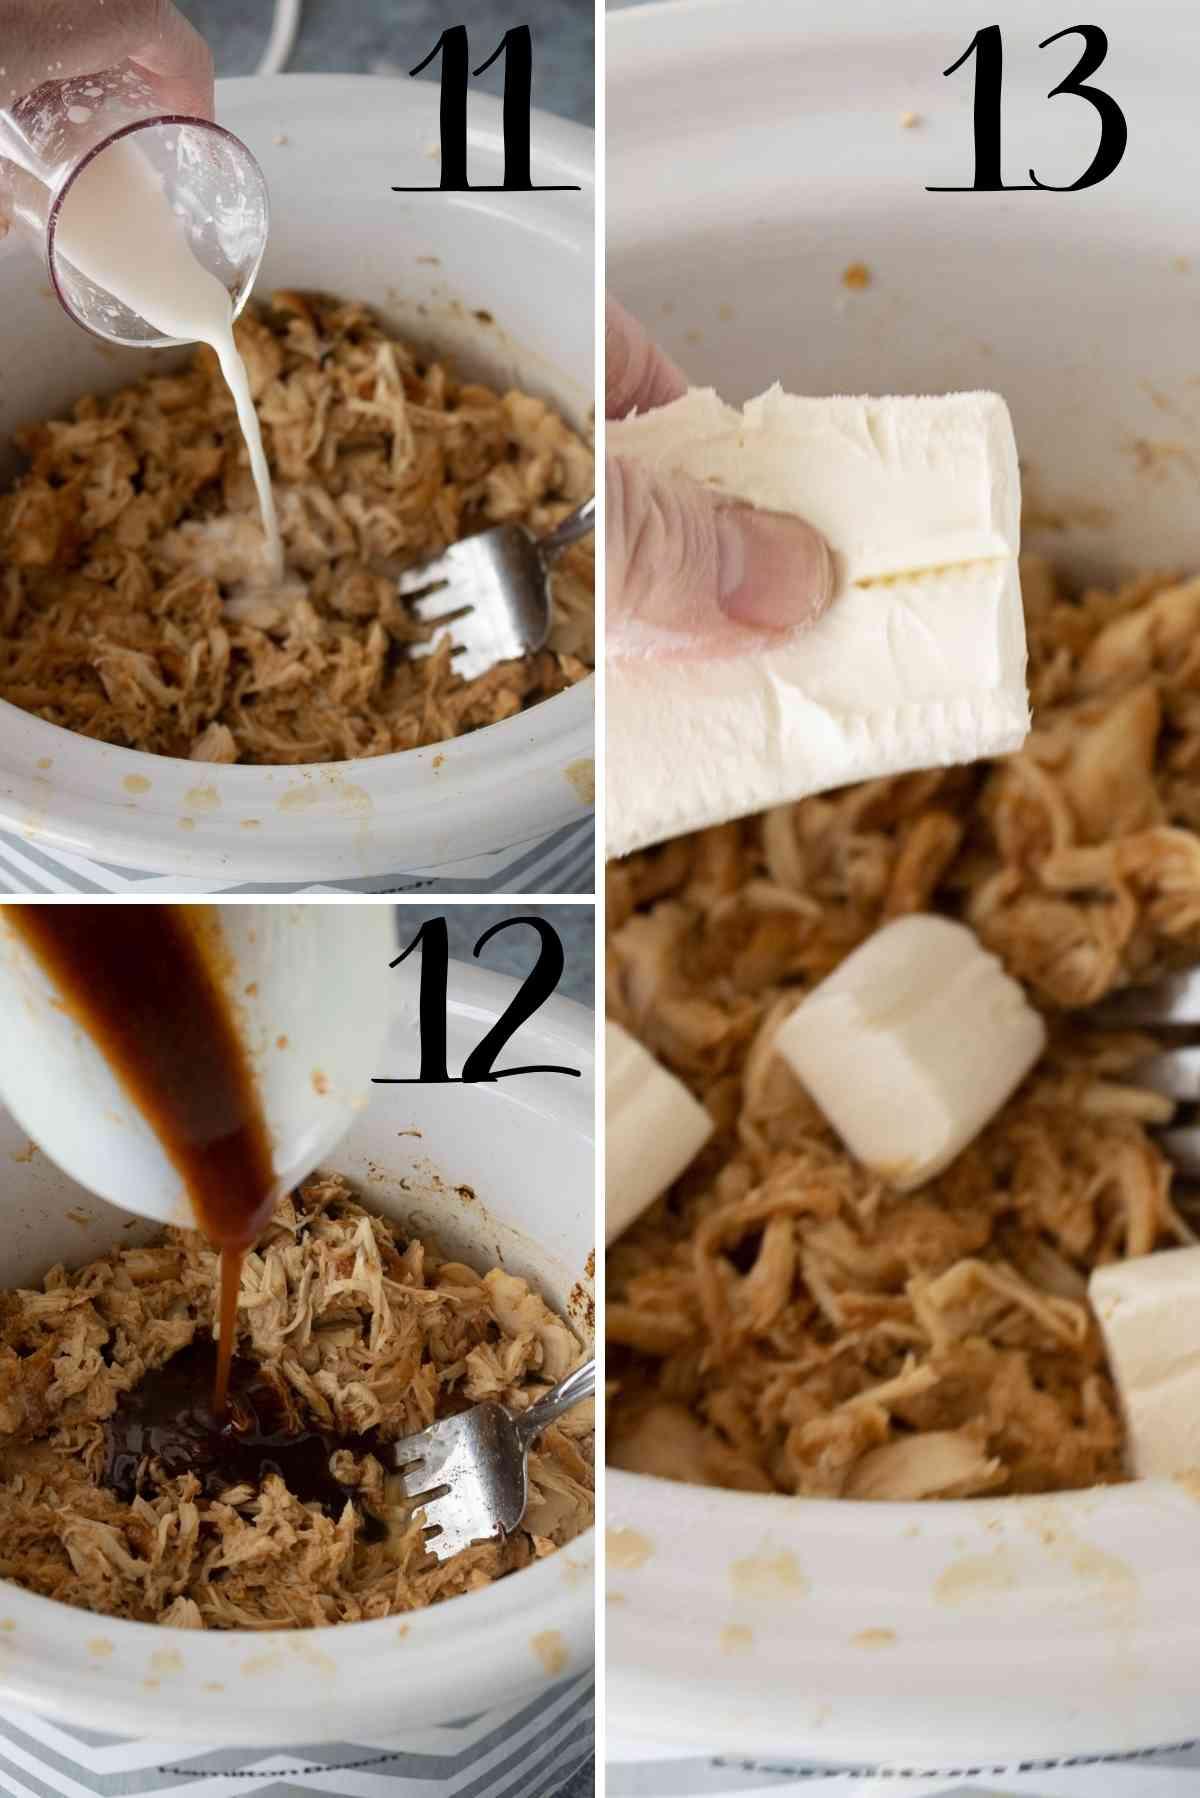 Add cornstarch water, remaining sauce and cream cheese.